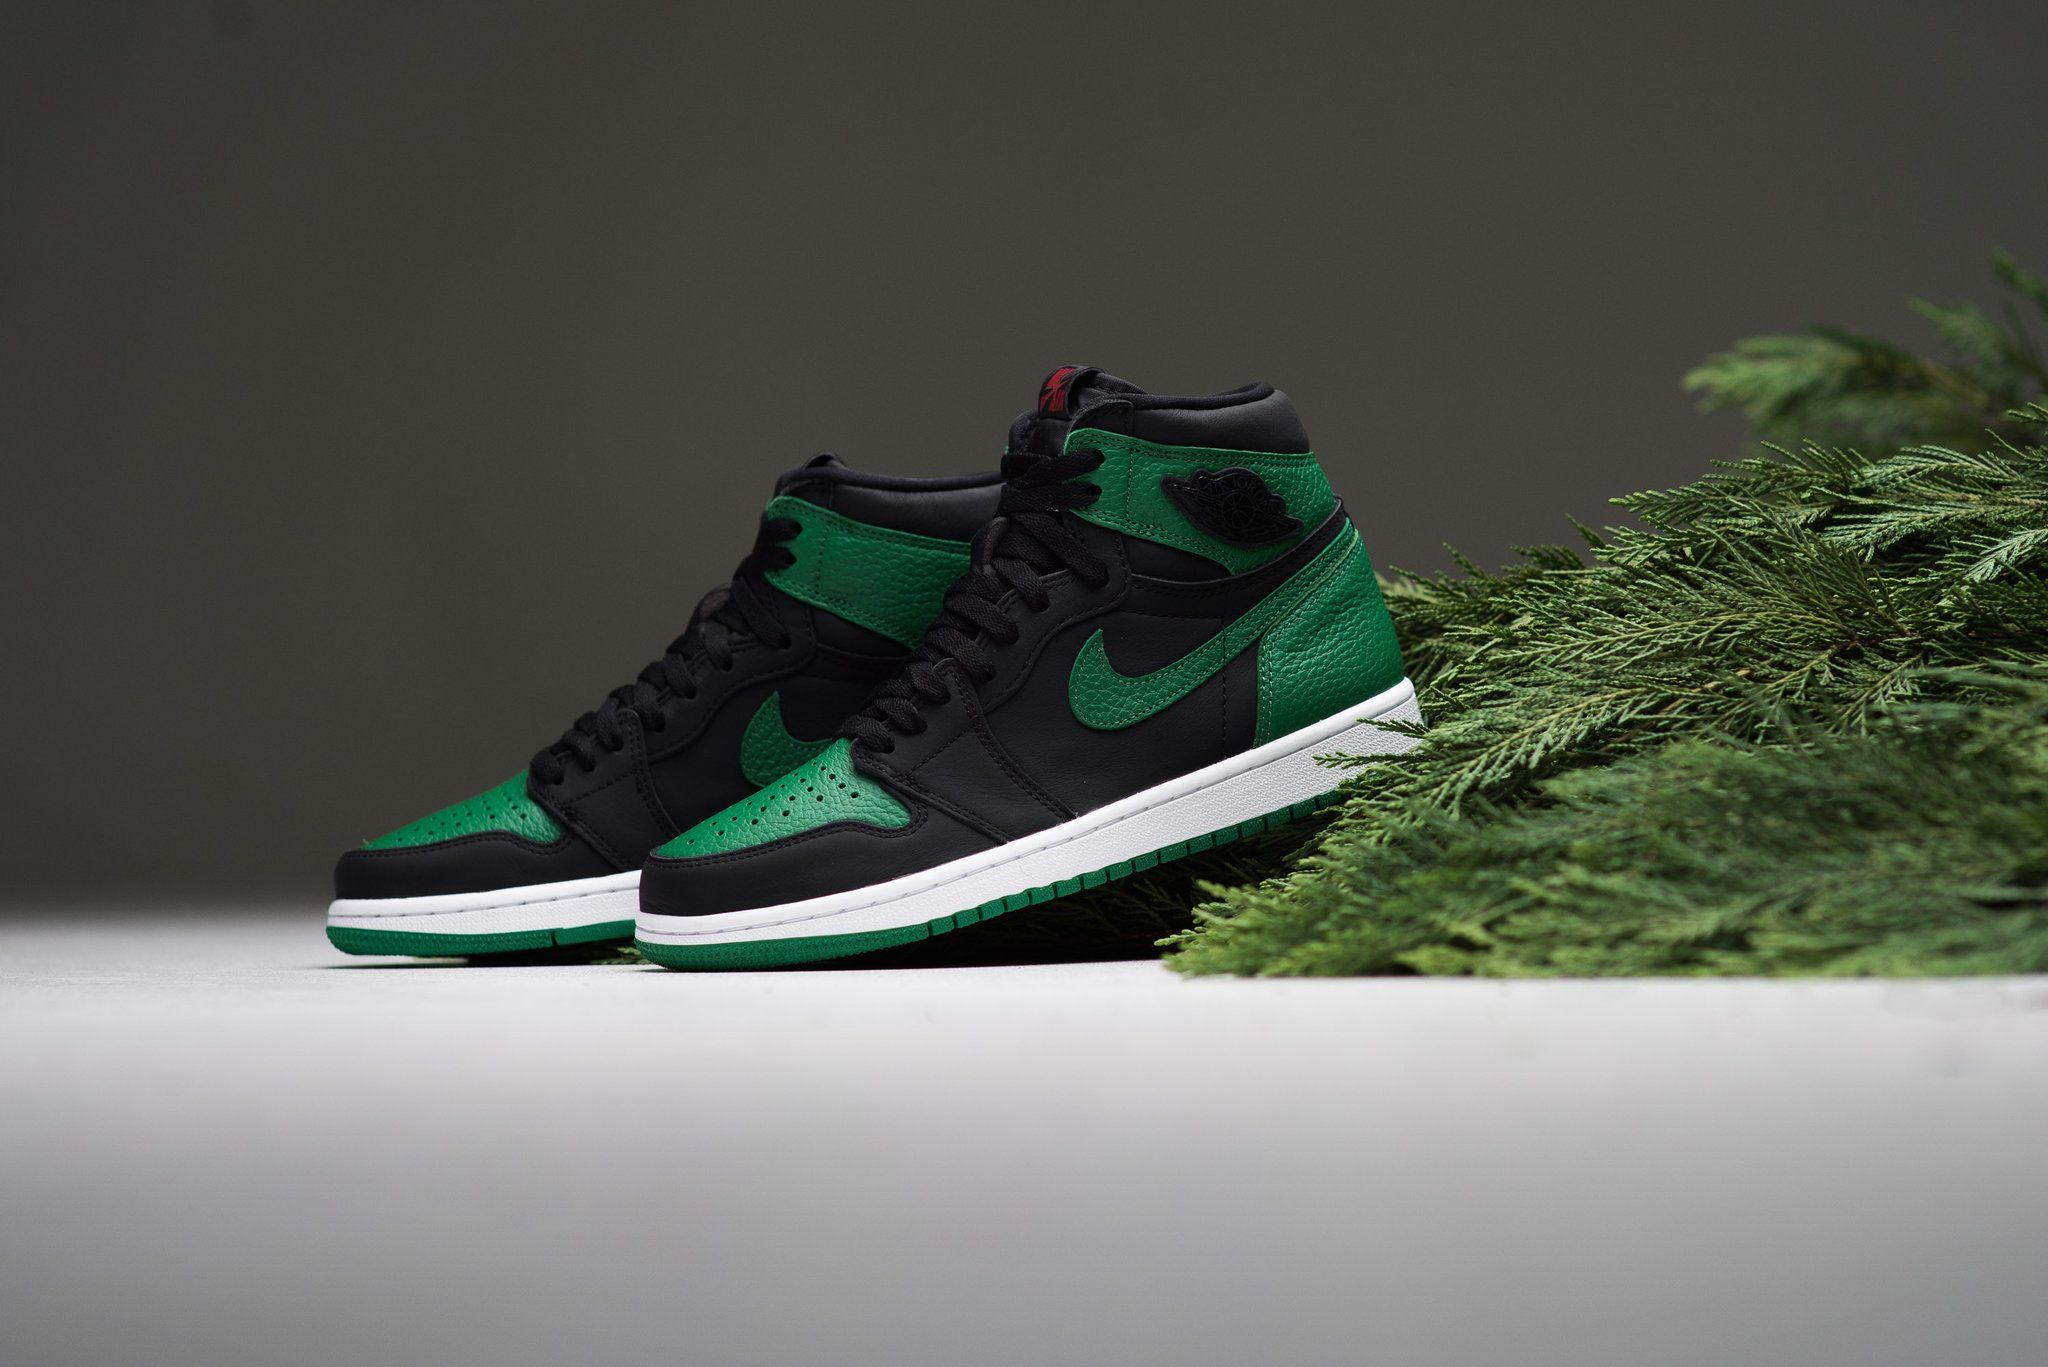 Le sneakers Nike saranno le scarpe ufficiali del team USA